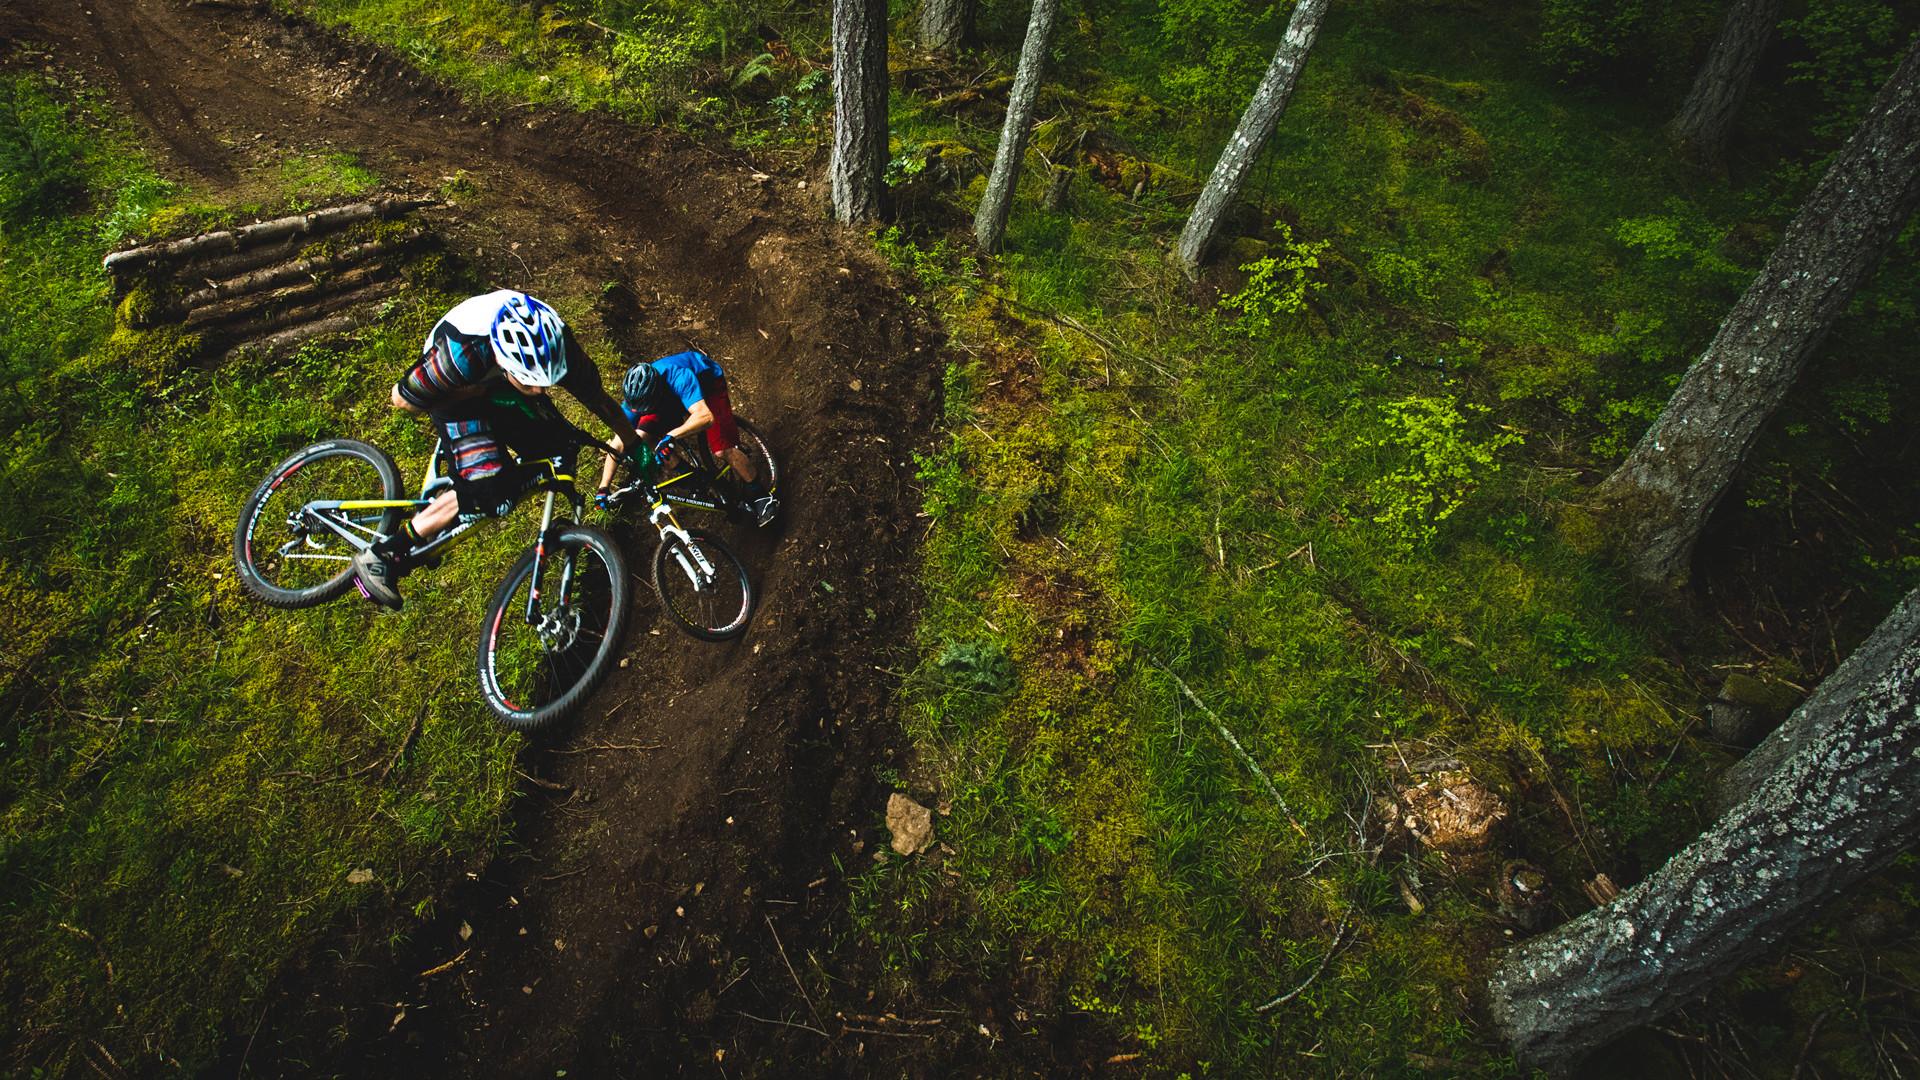 Extreme Mountain Biking Wallpaper